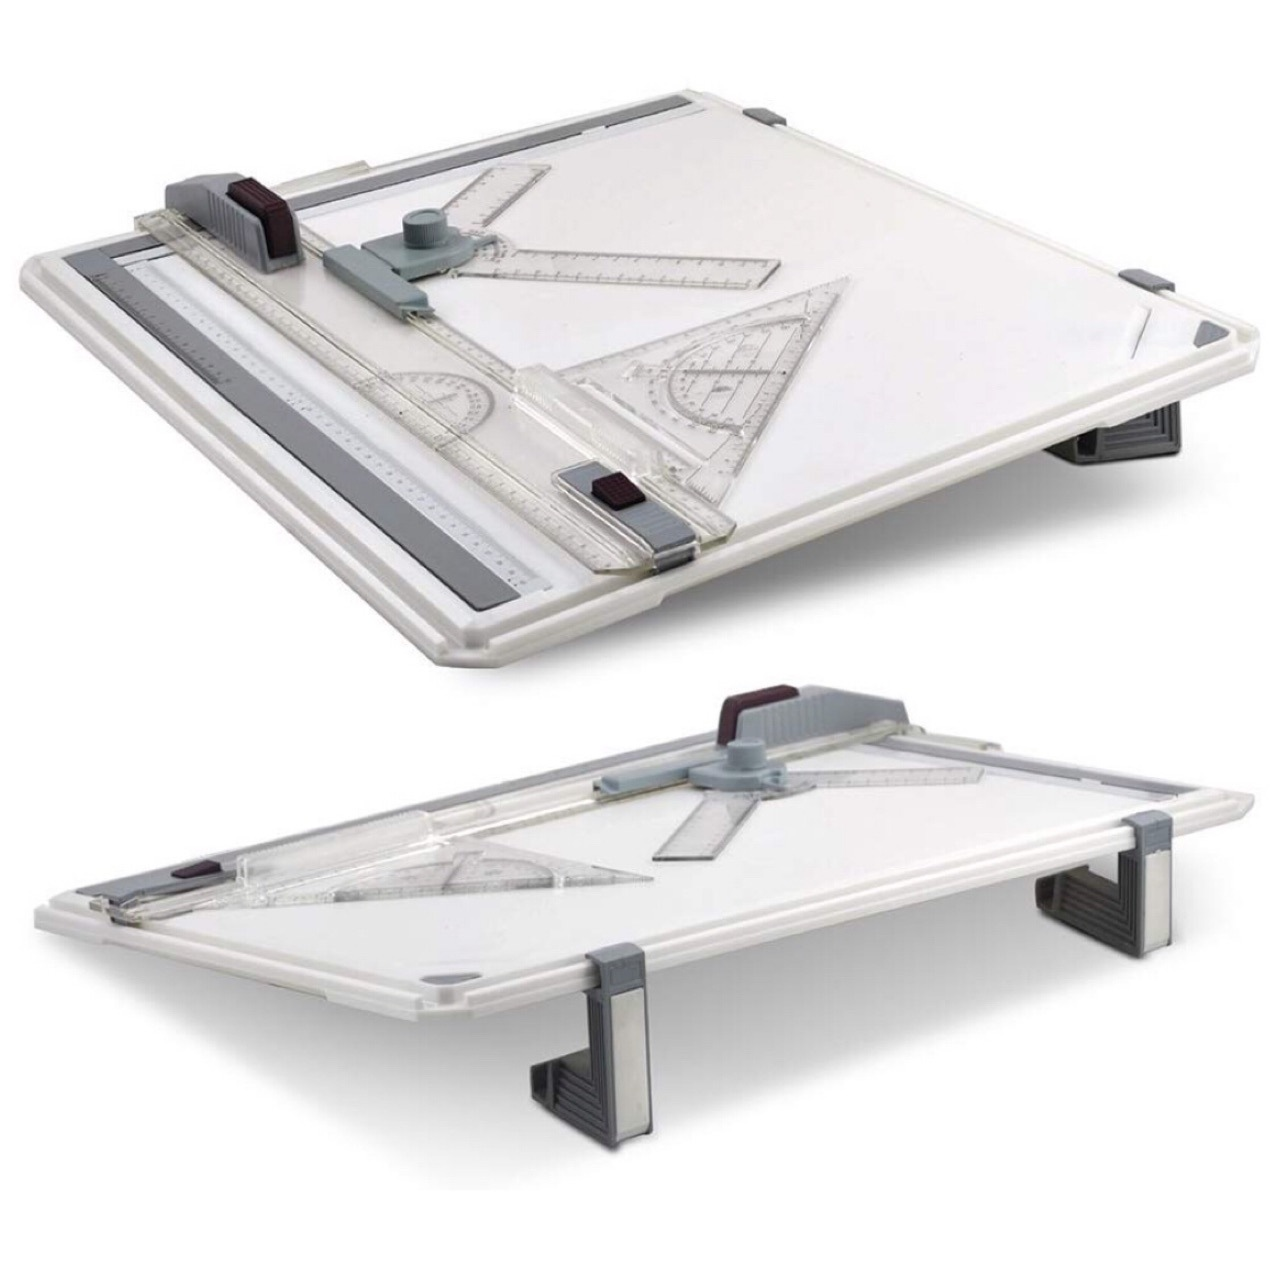 A3 Drawing Board Portable Drawing Board Fast-Shape Drawing Board